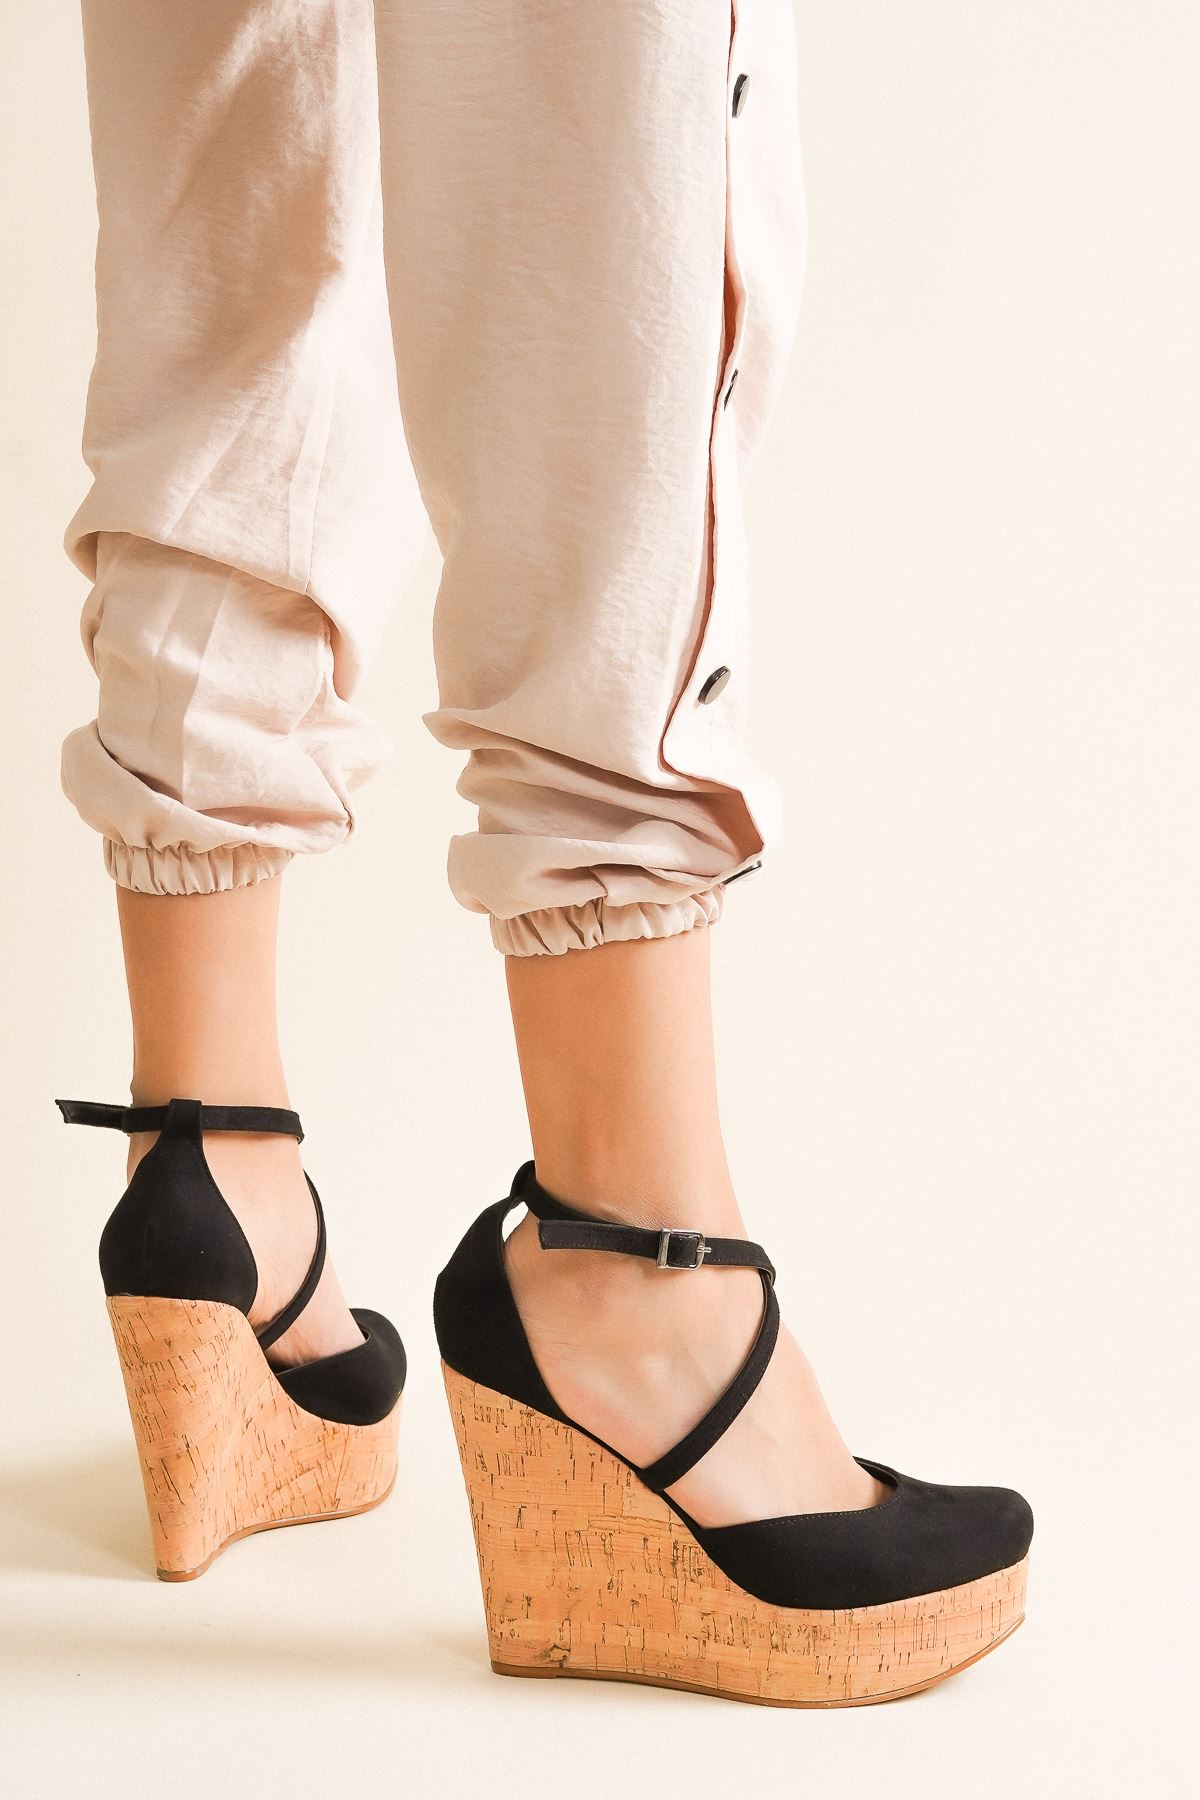 Moon Mantar Siyah Süet Dolgu Topuklu Ayakkabı